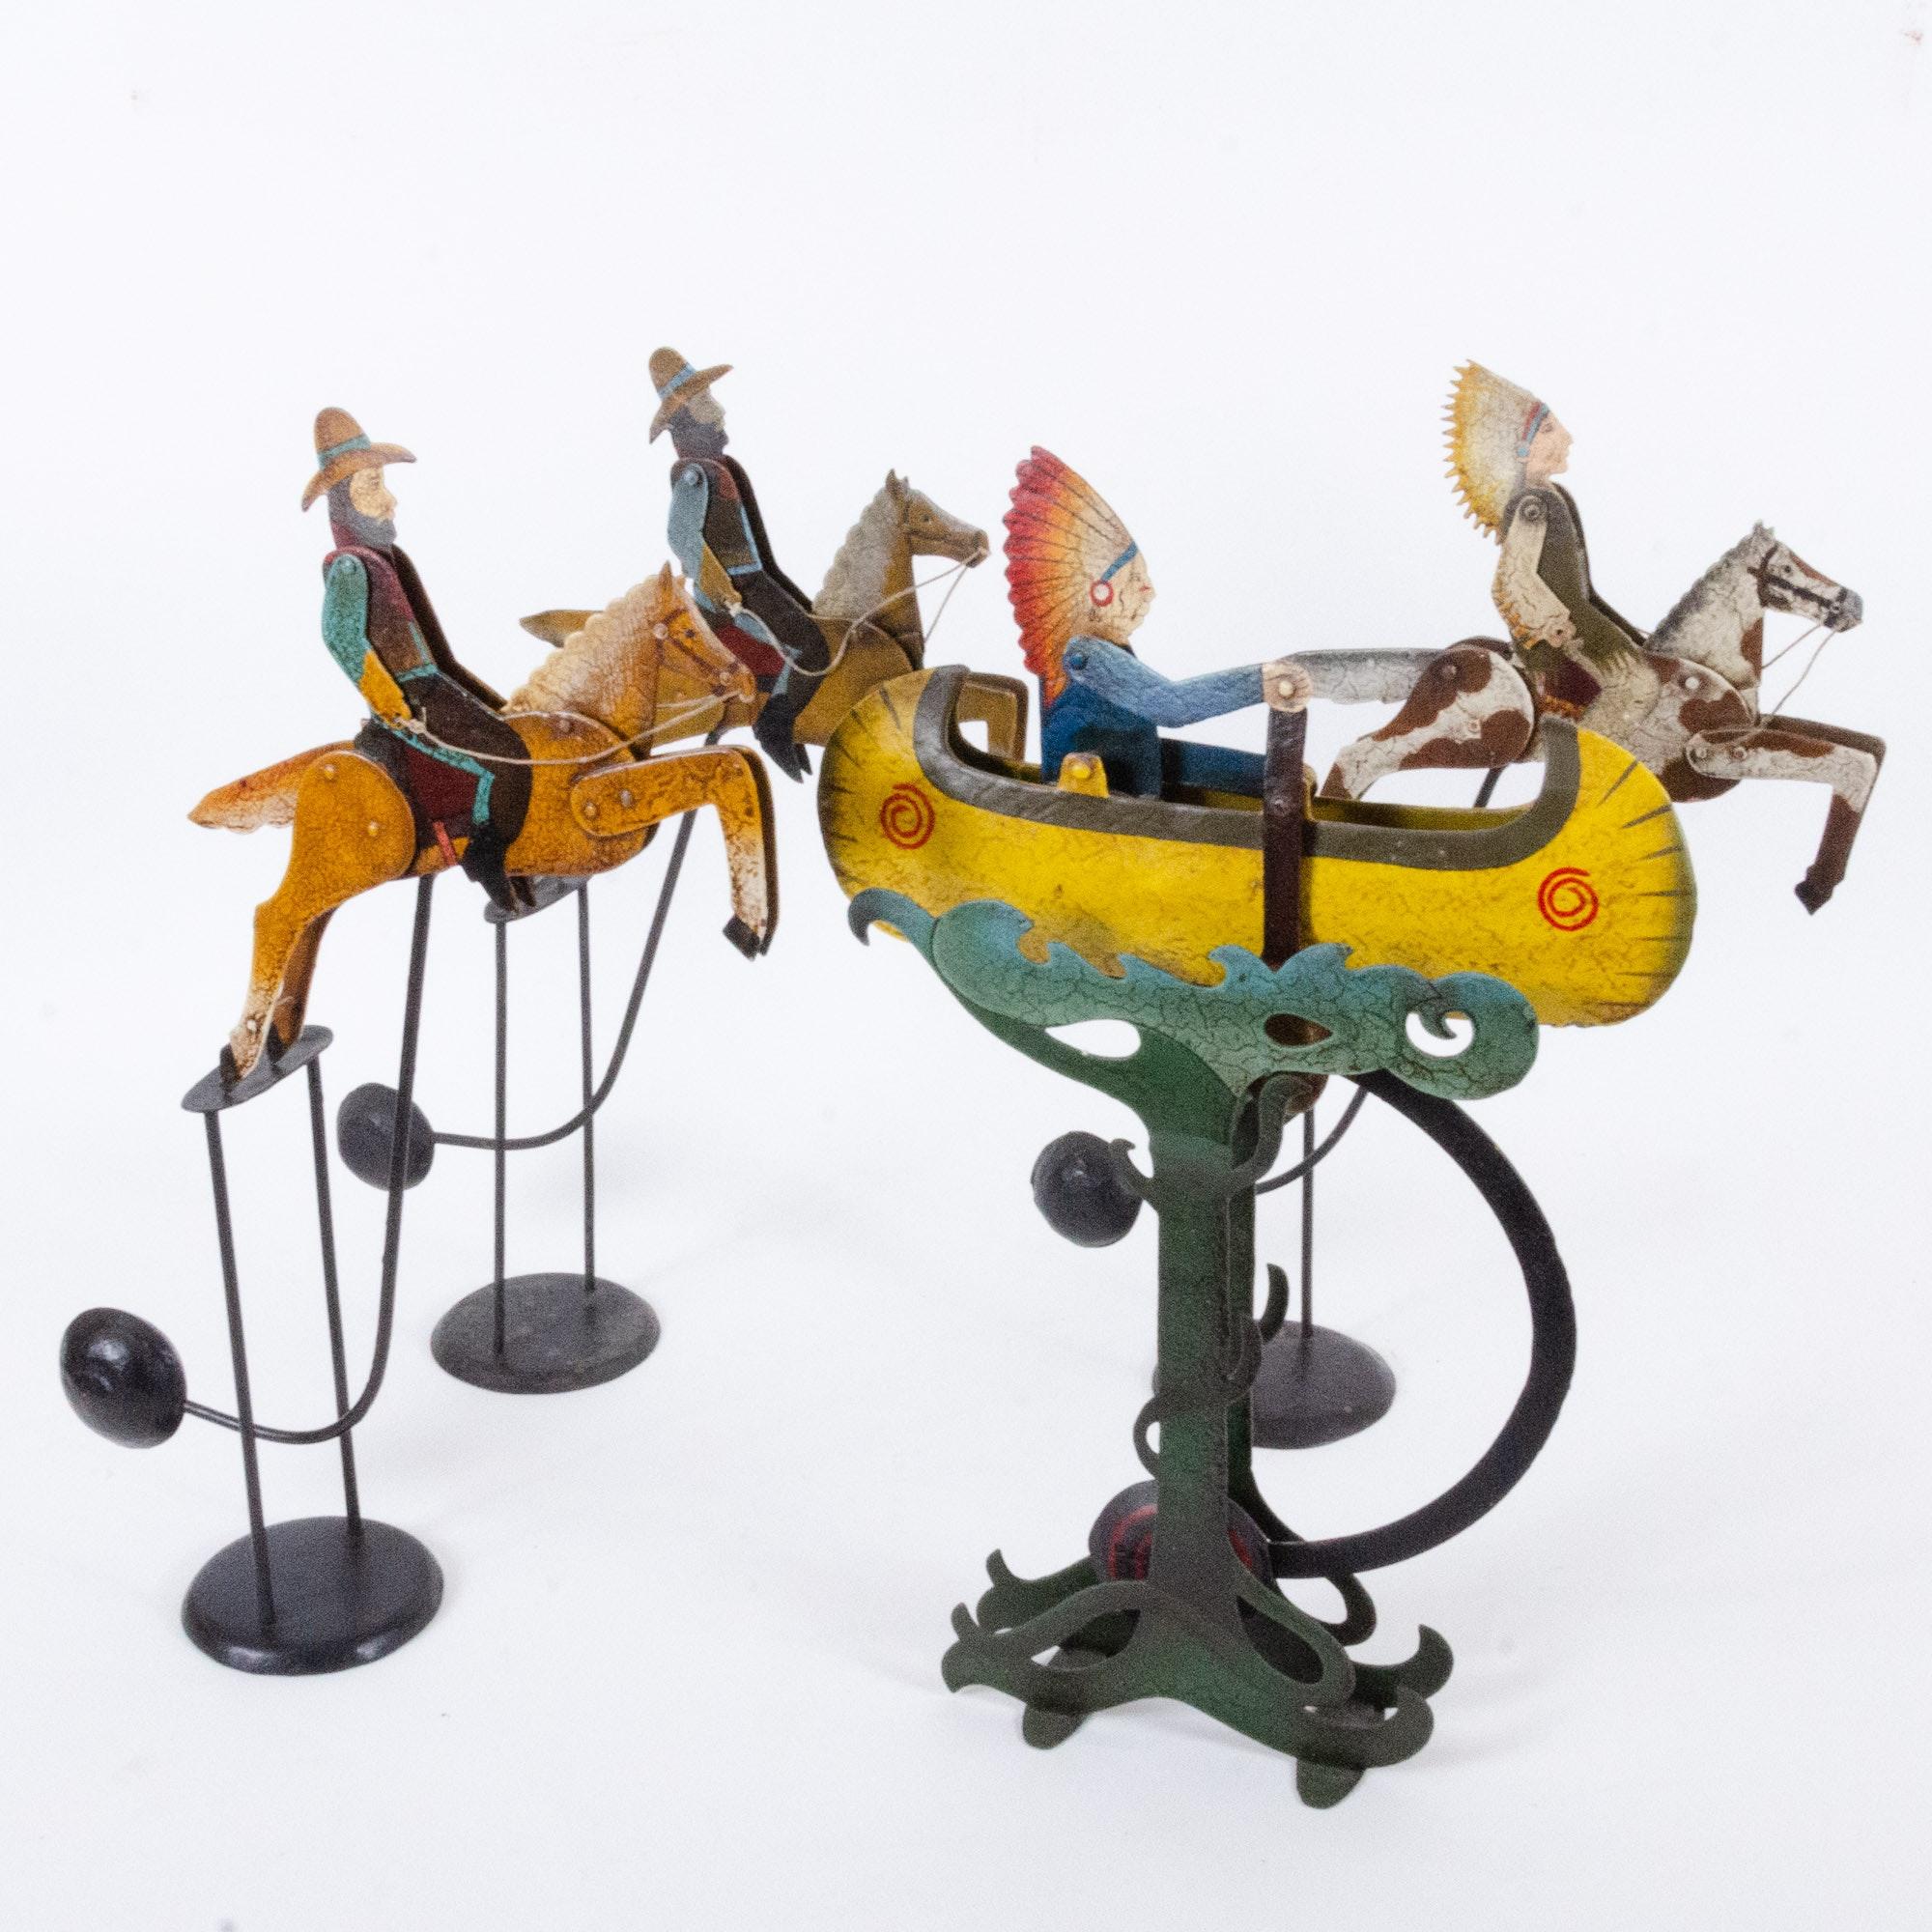 Handmade Western Themed Tin Kinetic Balancing Sculptures